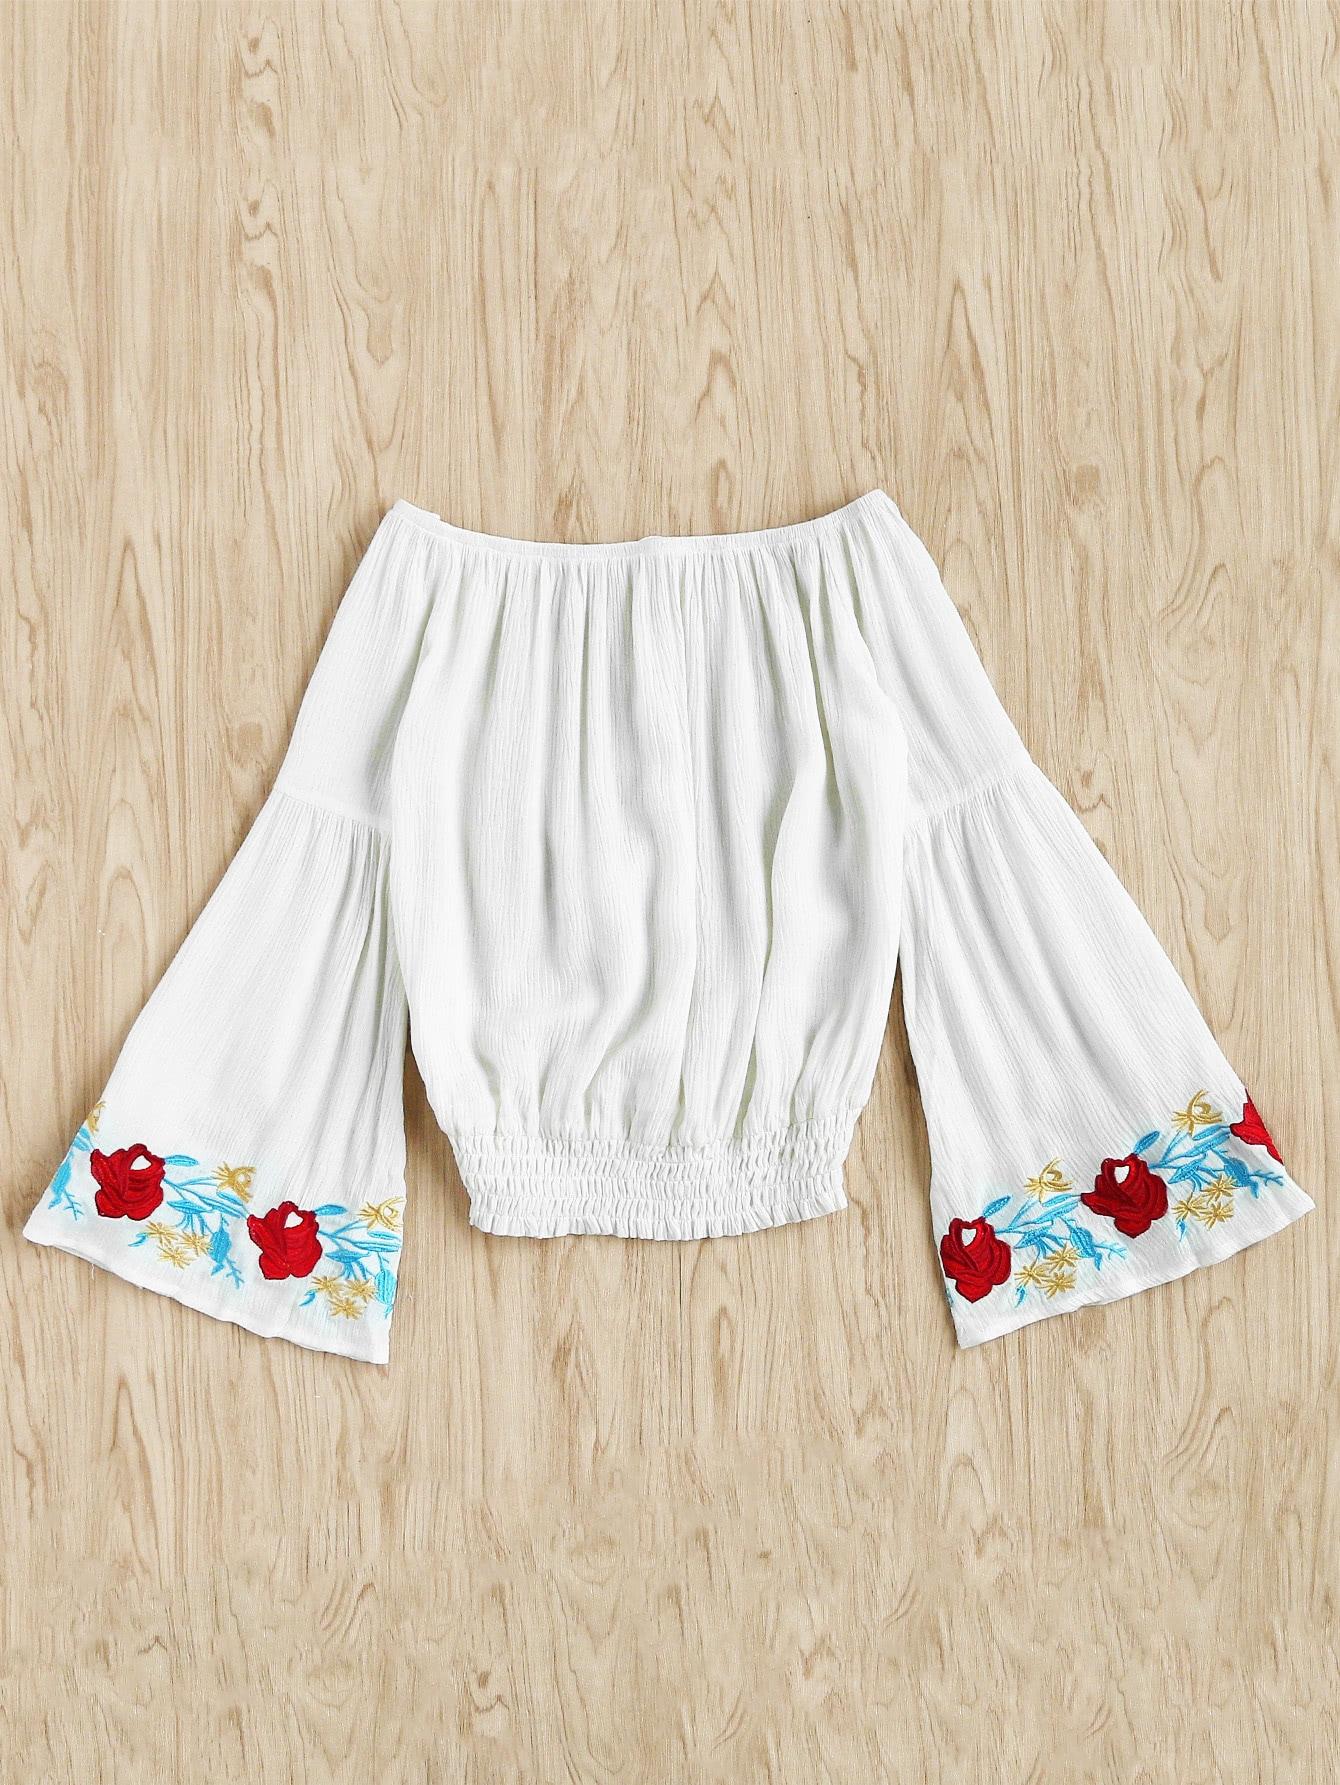 blouse170417702_2